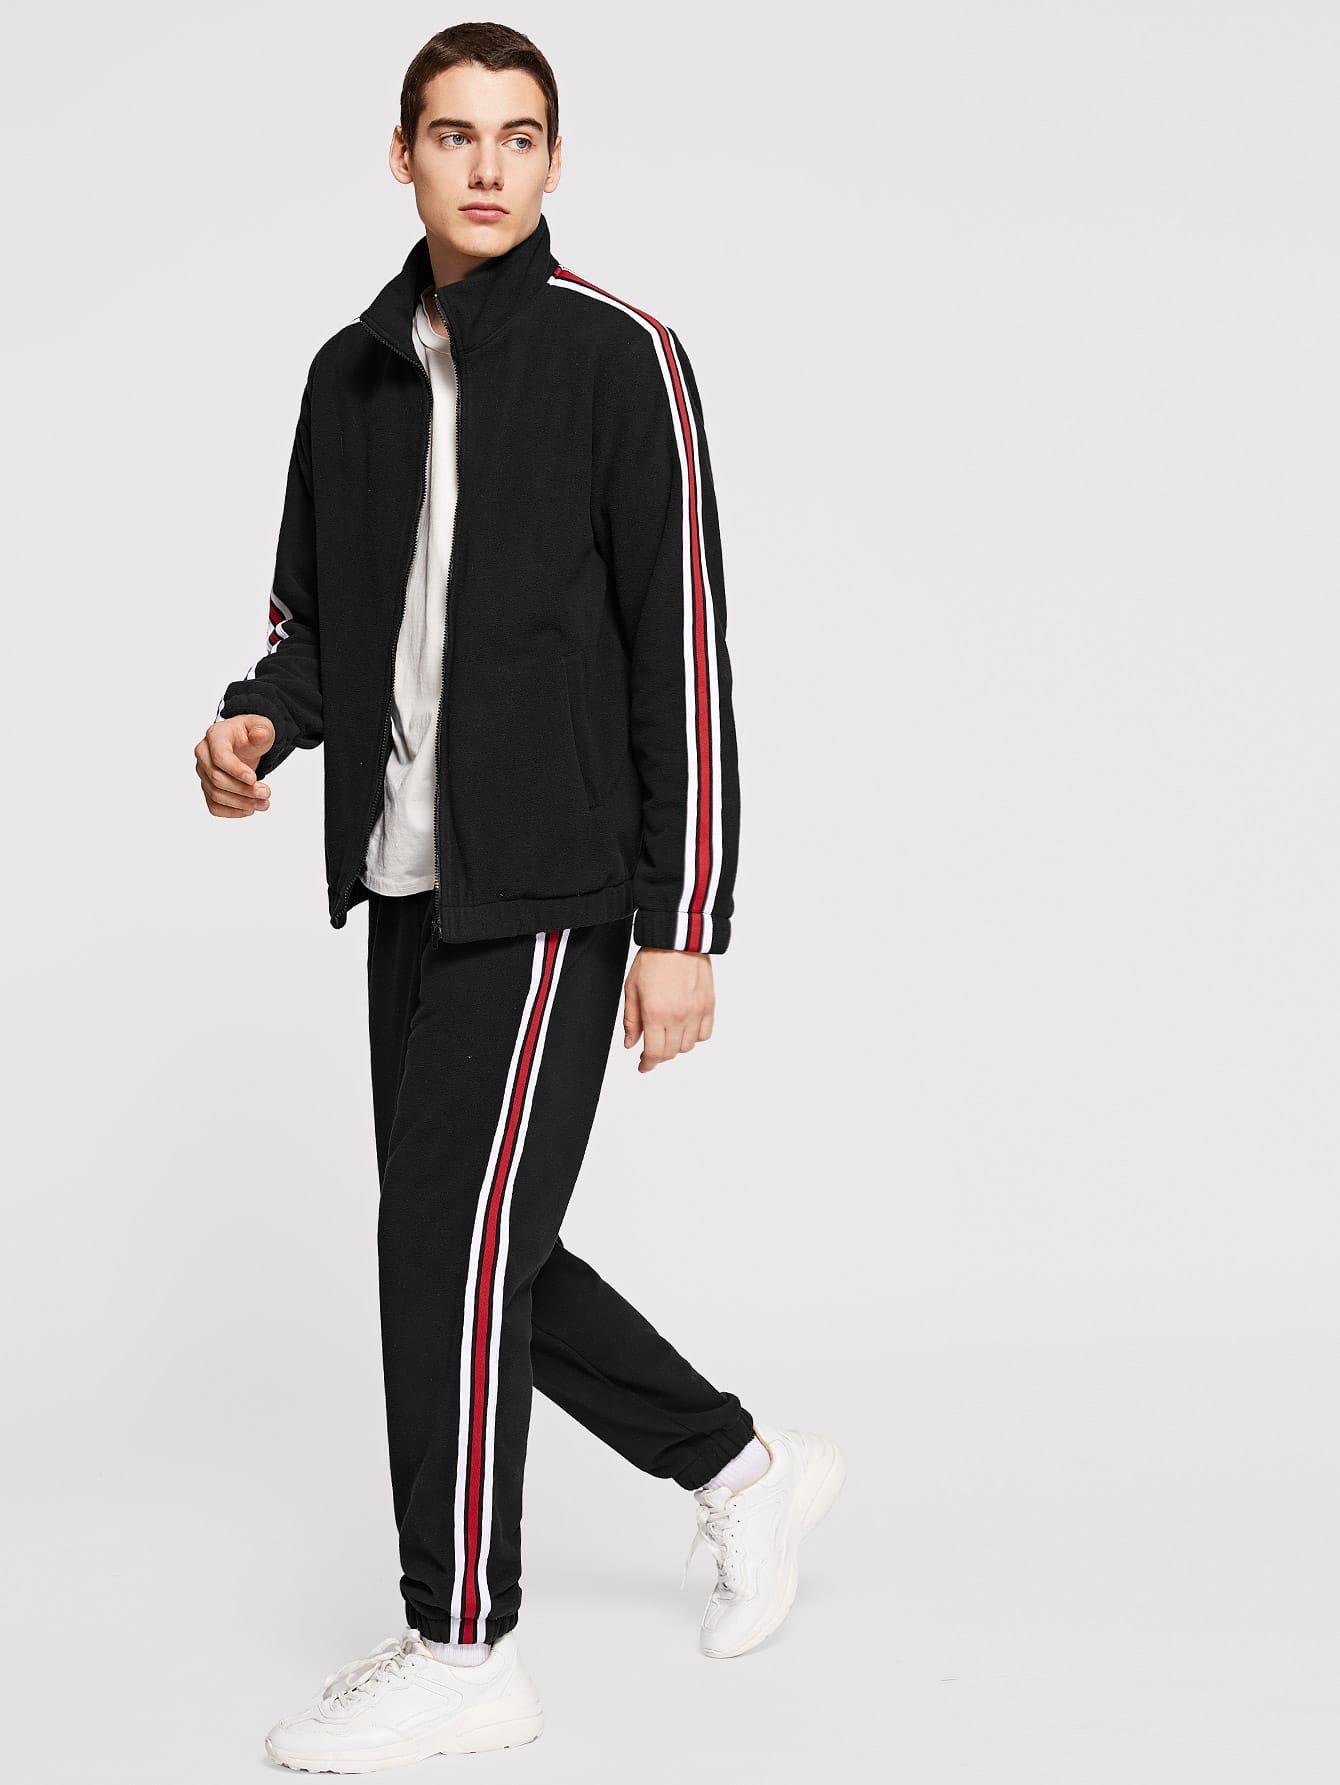 Men Zip Up Mock-Neck Striped Jacket & Pants Set Men Zip Up Mock-Neck Striped Jacket & Pants Set